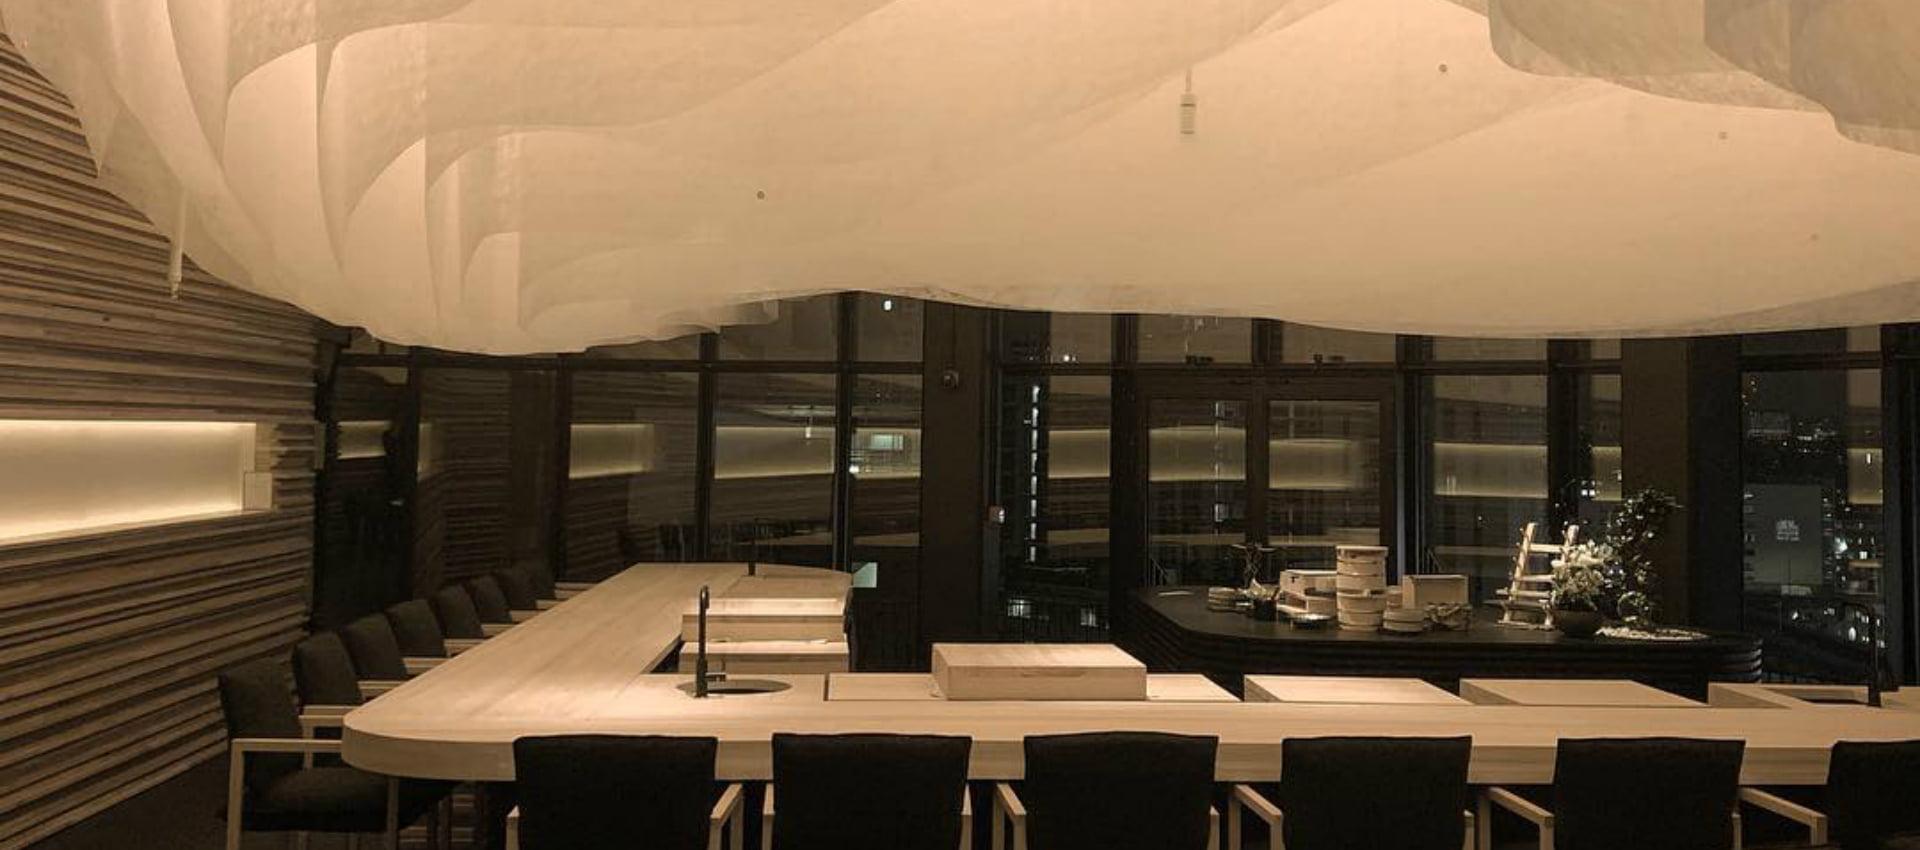 Stupendous All The Michelin Star Restaurants In London 2019 2020 The Machost Co Dining Chair Design Ideas Machostcouk